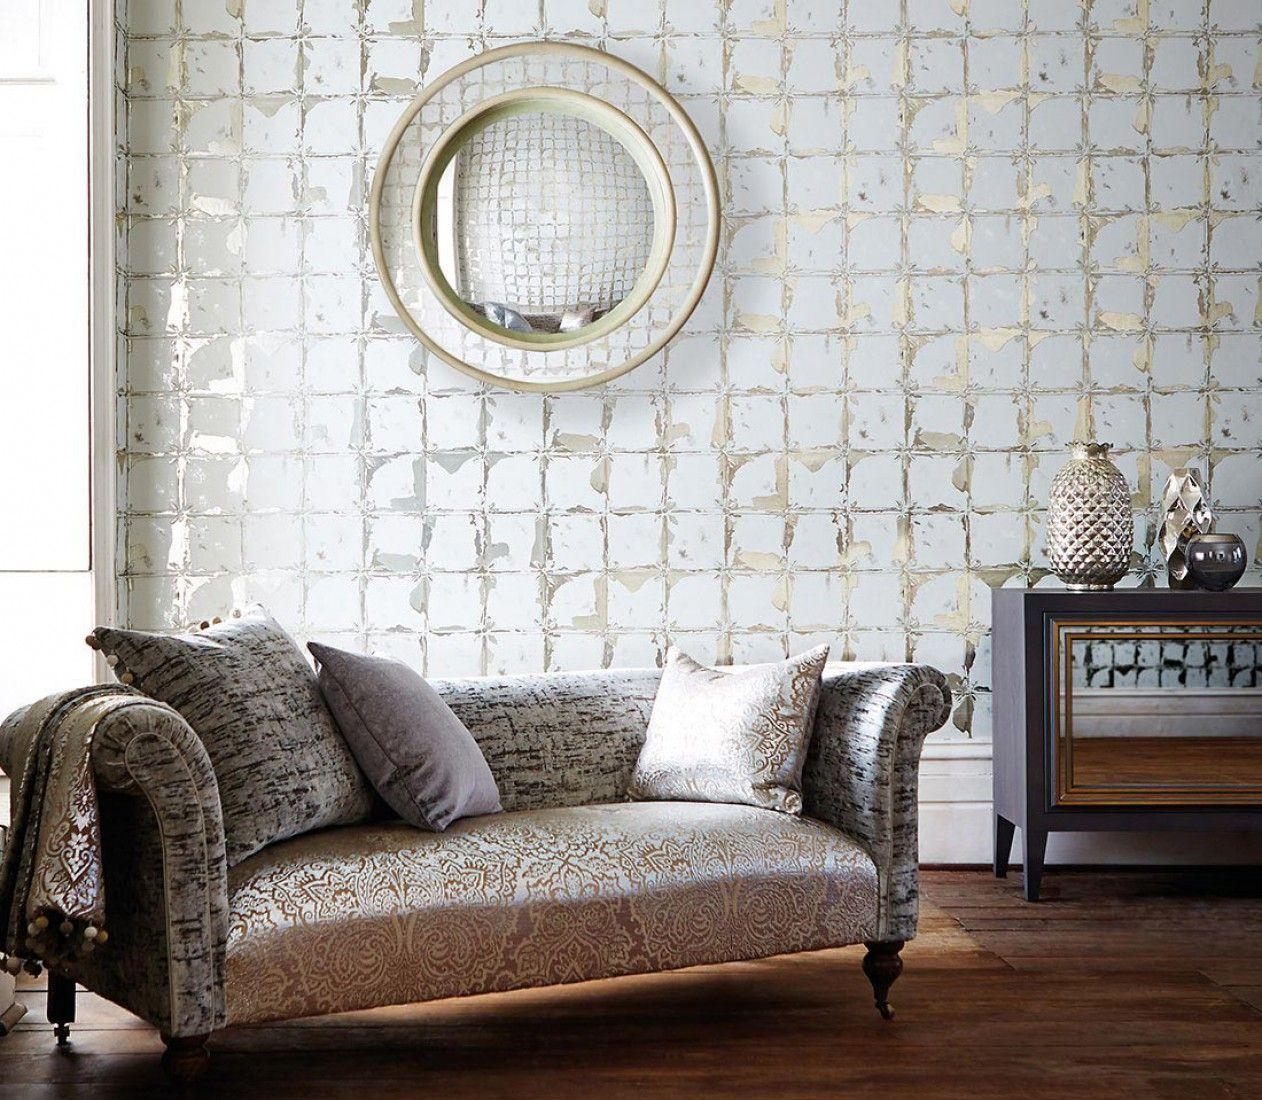 abiona pinterest kacheln oberfl che und glatt. Black Bedroom Furniture Sets. Home Design Ideas